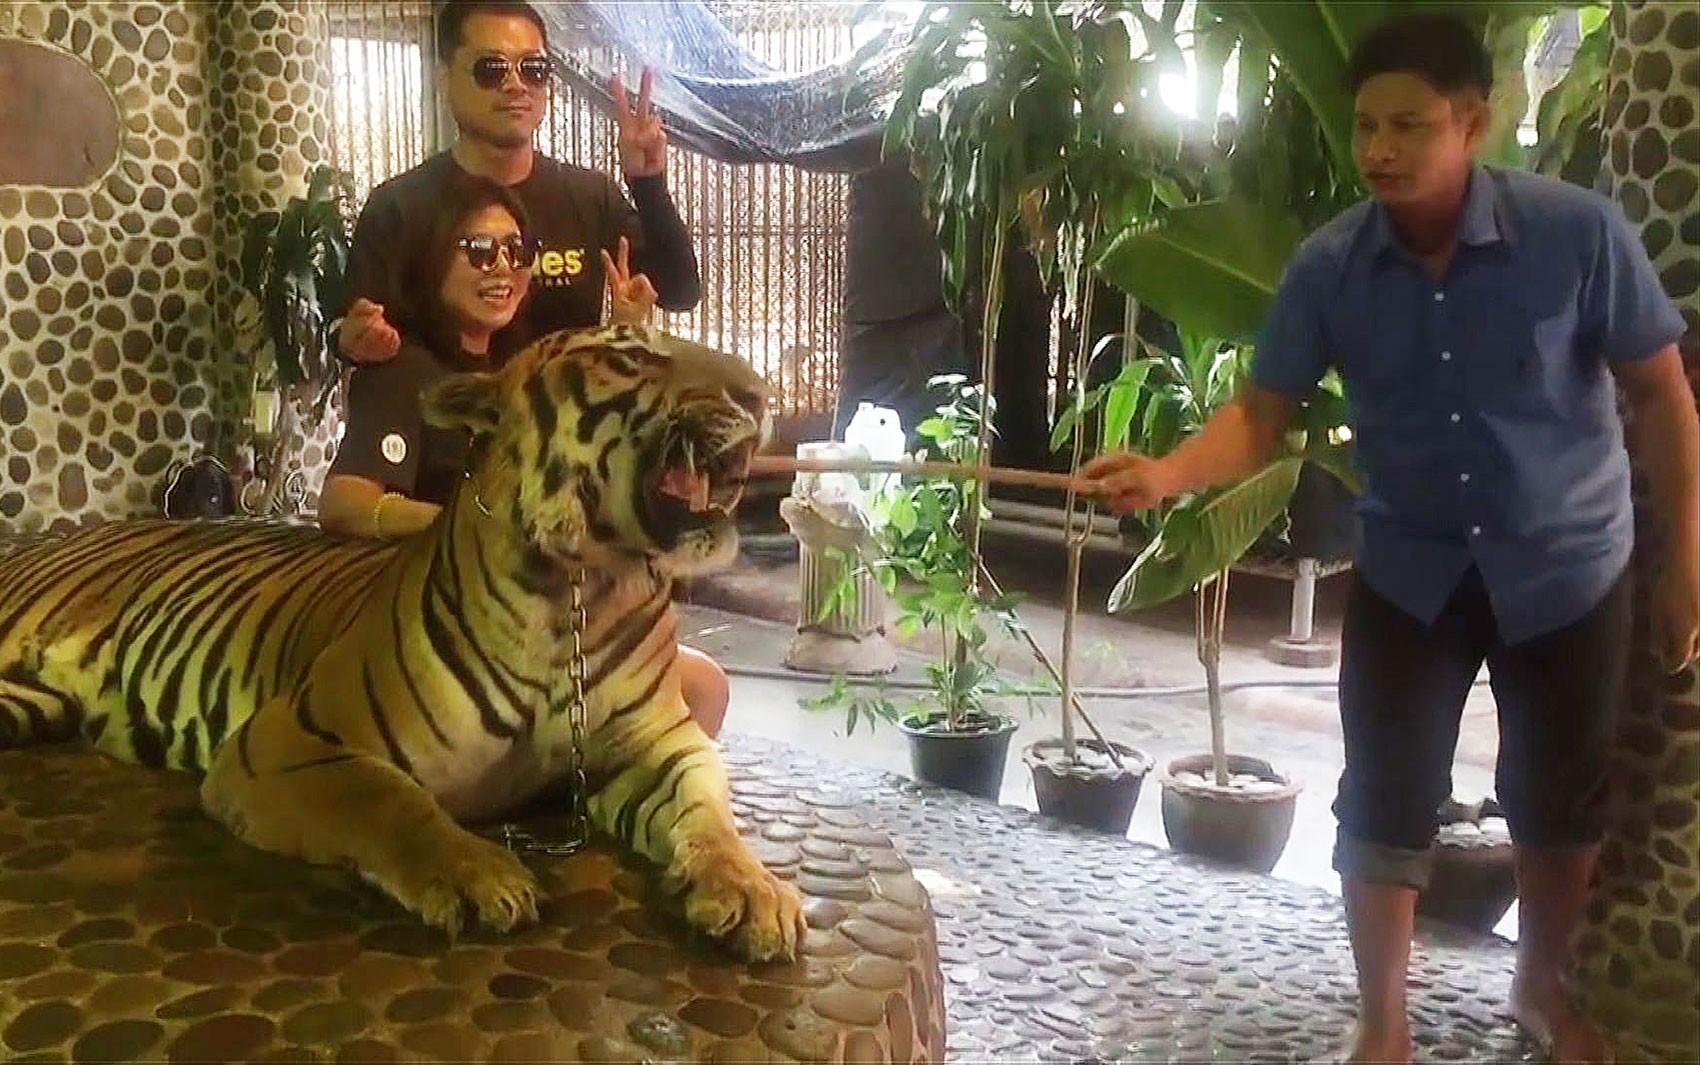 Maus-tratos a tigre para selfies de turistas revolta Tailândia